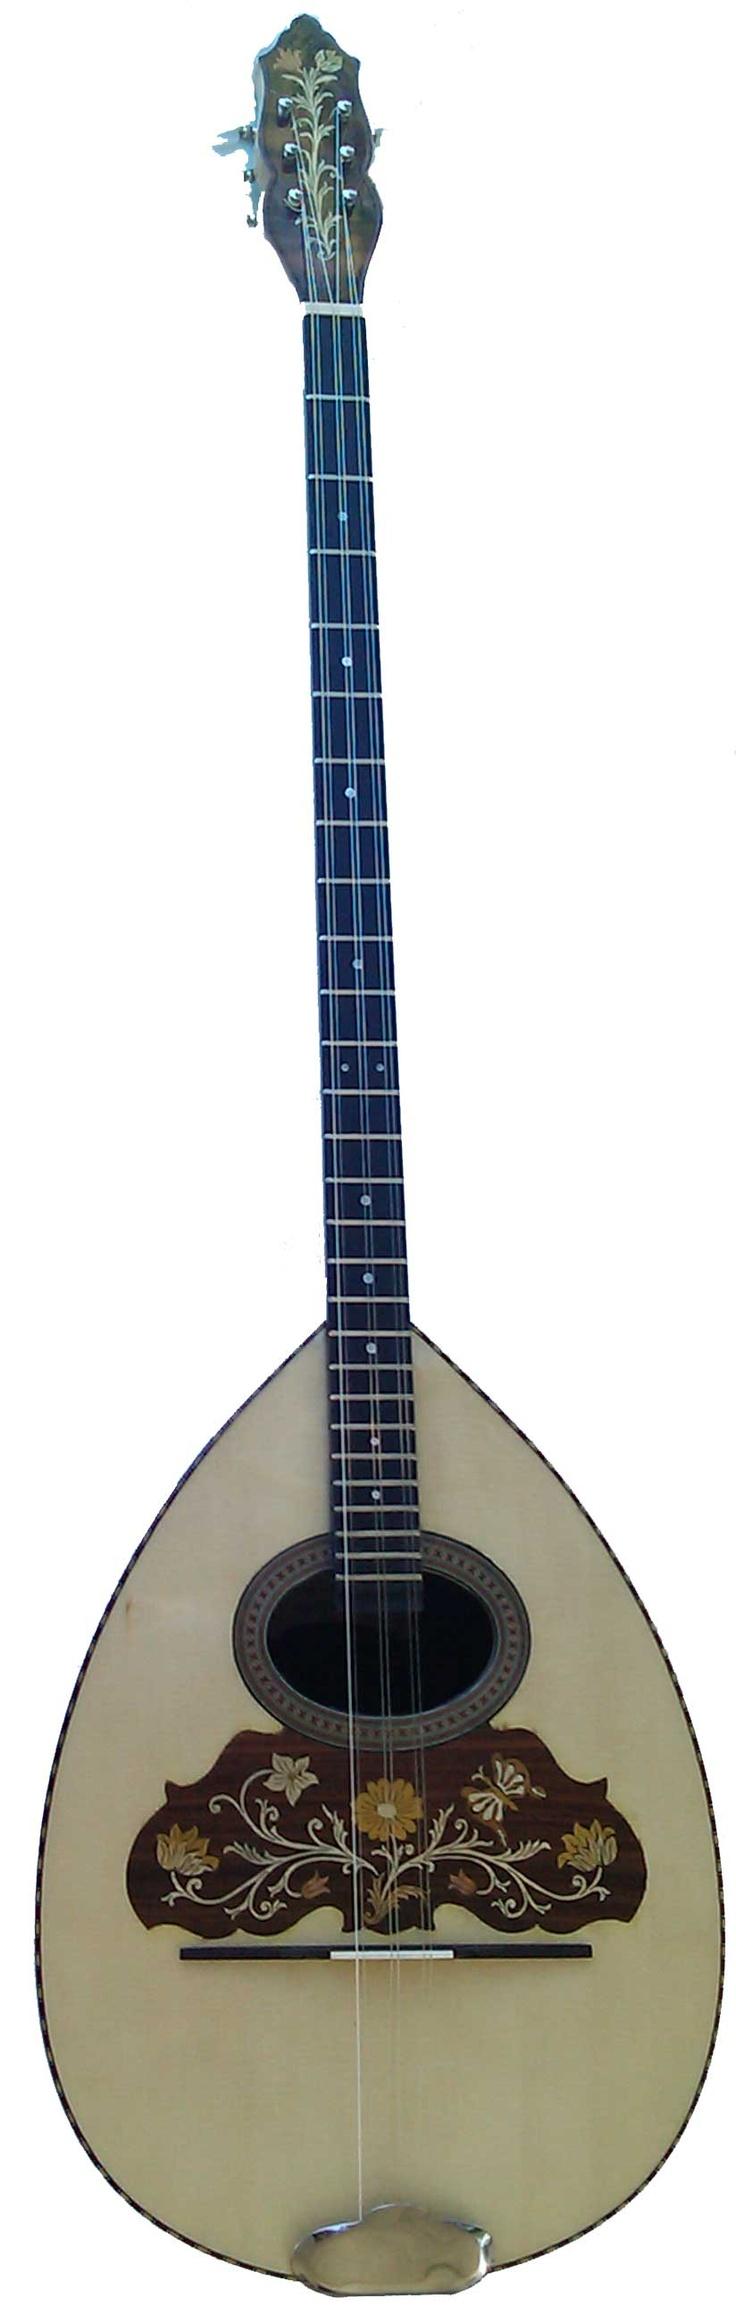 The Original Greek Bouzouki called a Trikortho, ( 3 pairs if strings tuned DAD, used in Rebetika, (Greek Blues) circa 1920's to mid 1940's. More Oriental sounding than the modern Bouzouki.